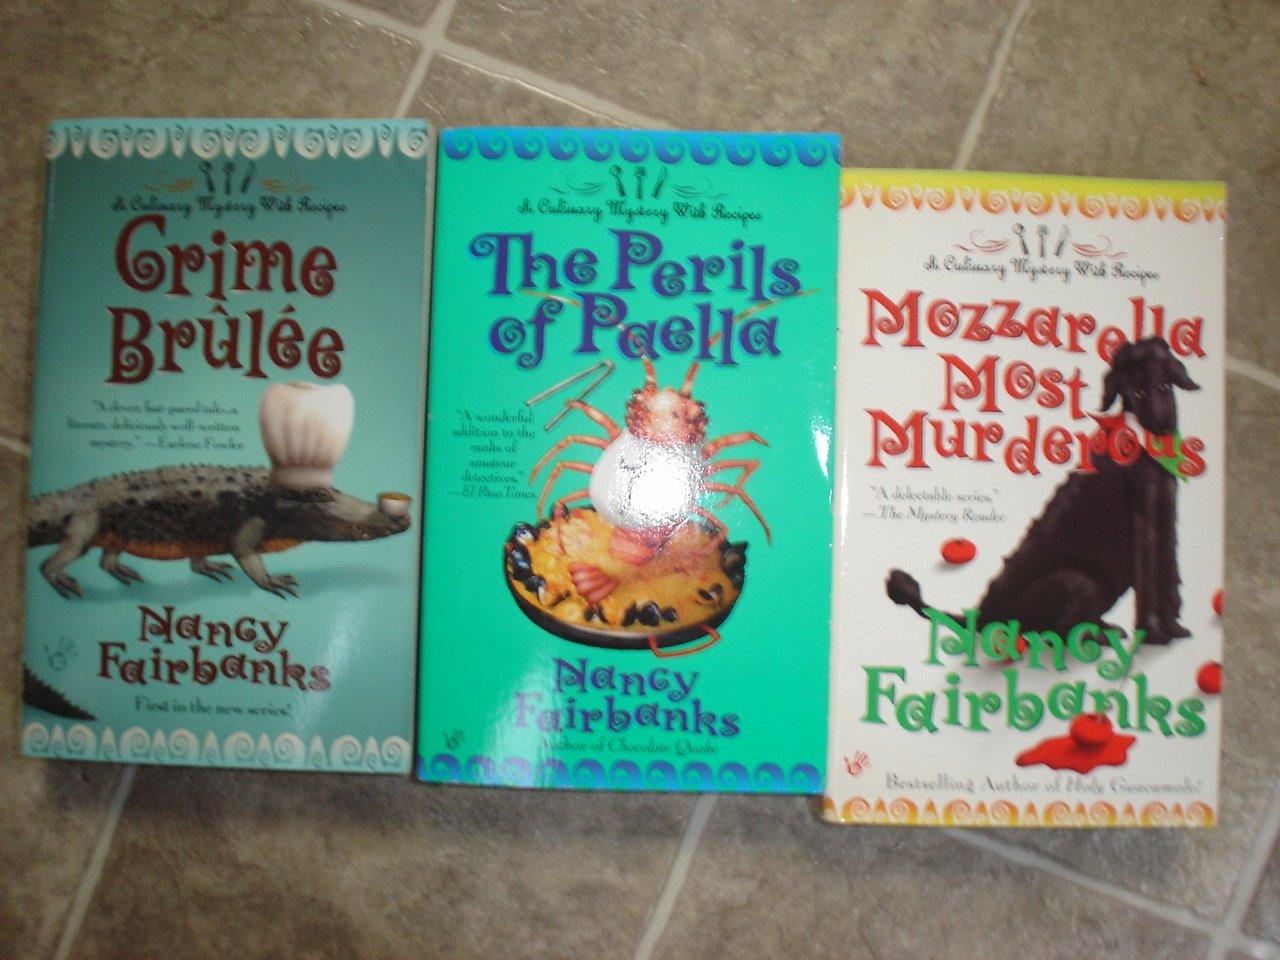 Nancy Fairbanks lot of 3 pb mystery books cozy Culinary Carolyn Blue Berkley Prime Crime